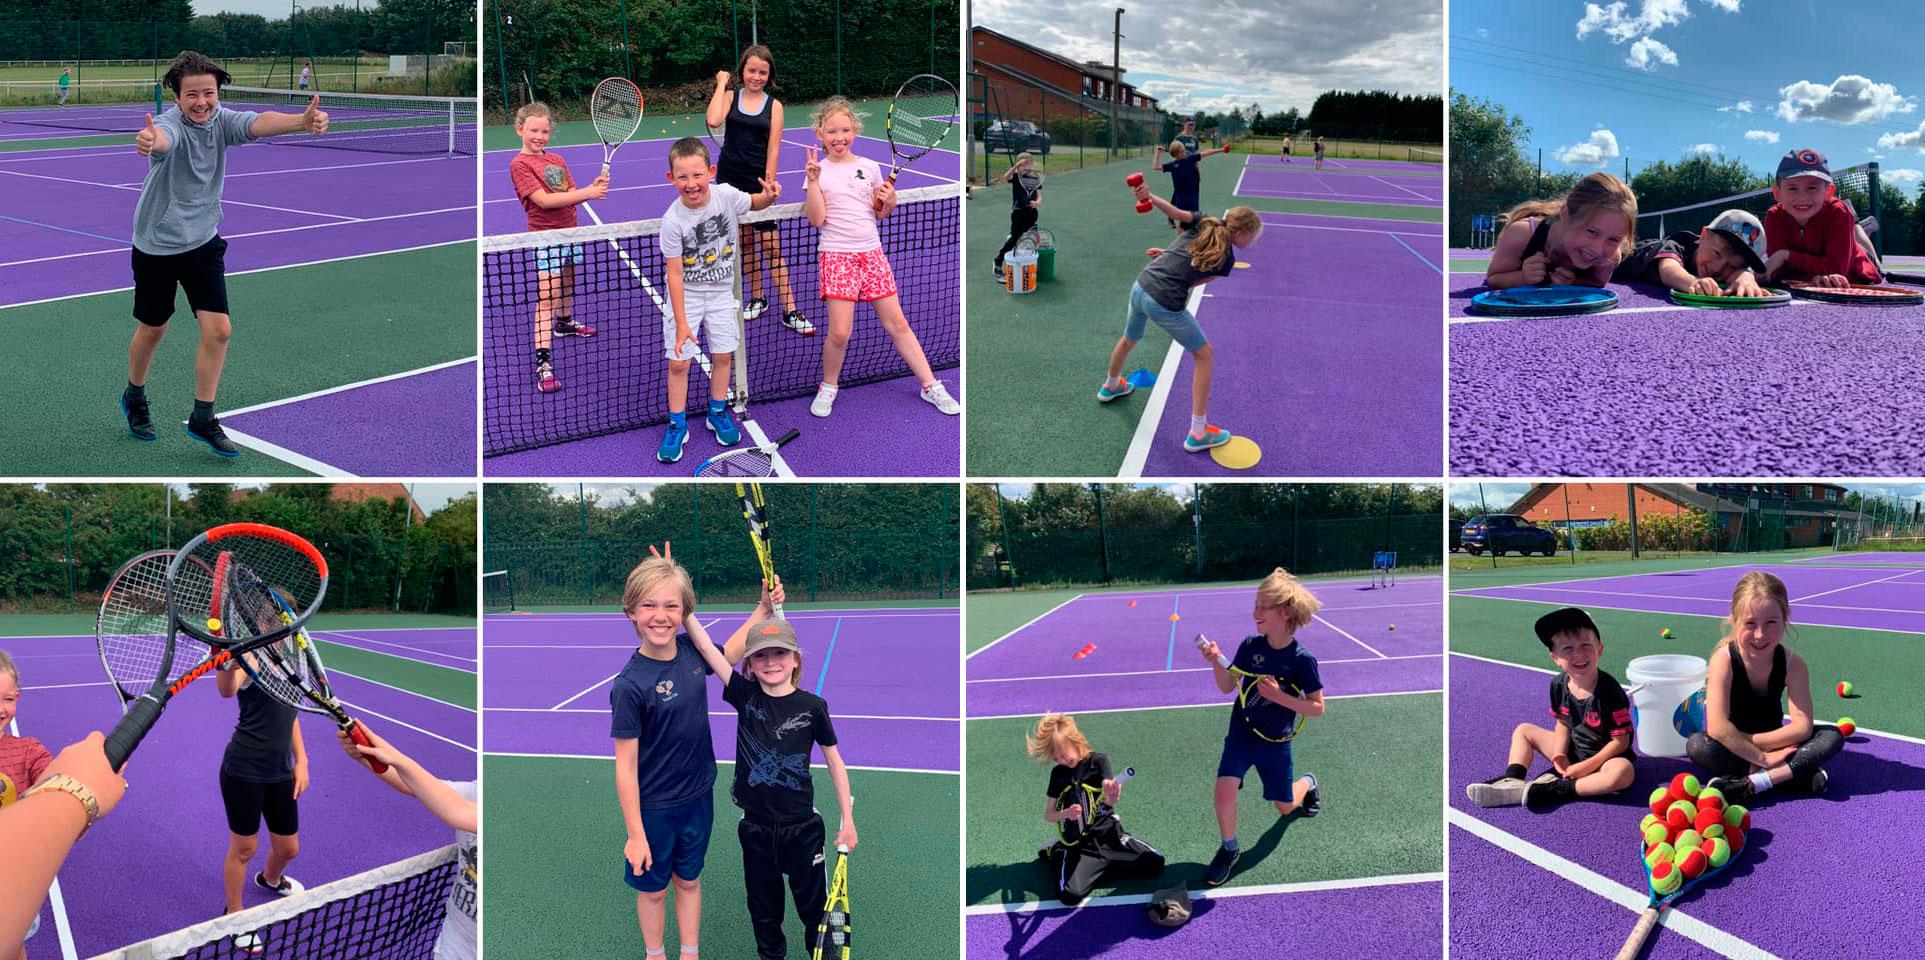 children's Tennis Coaching with Sasha Taylor